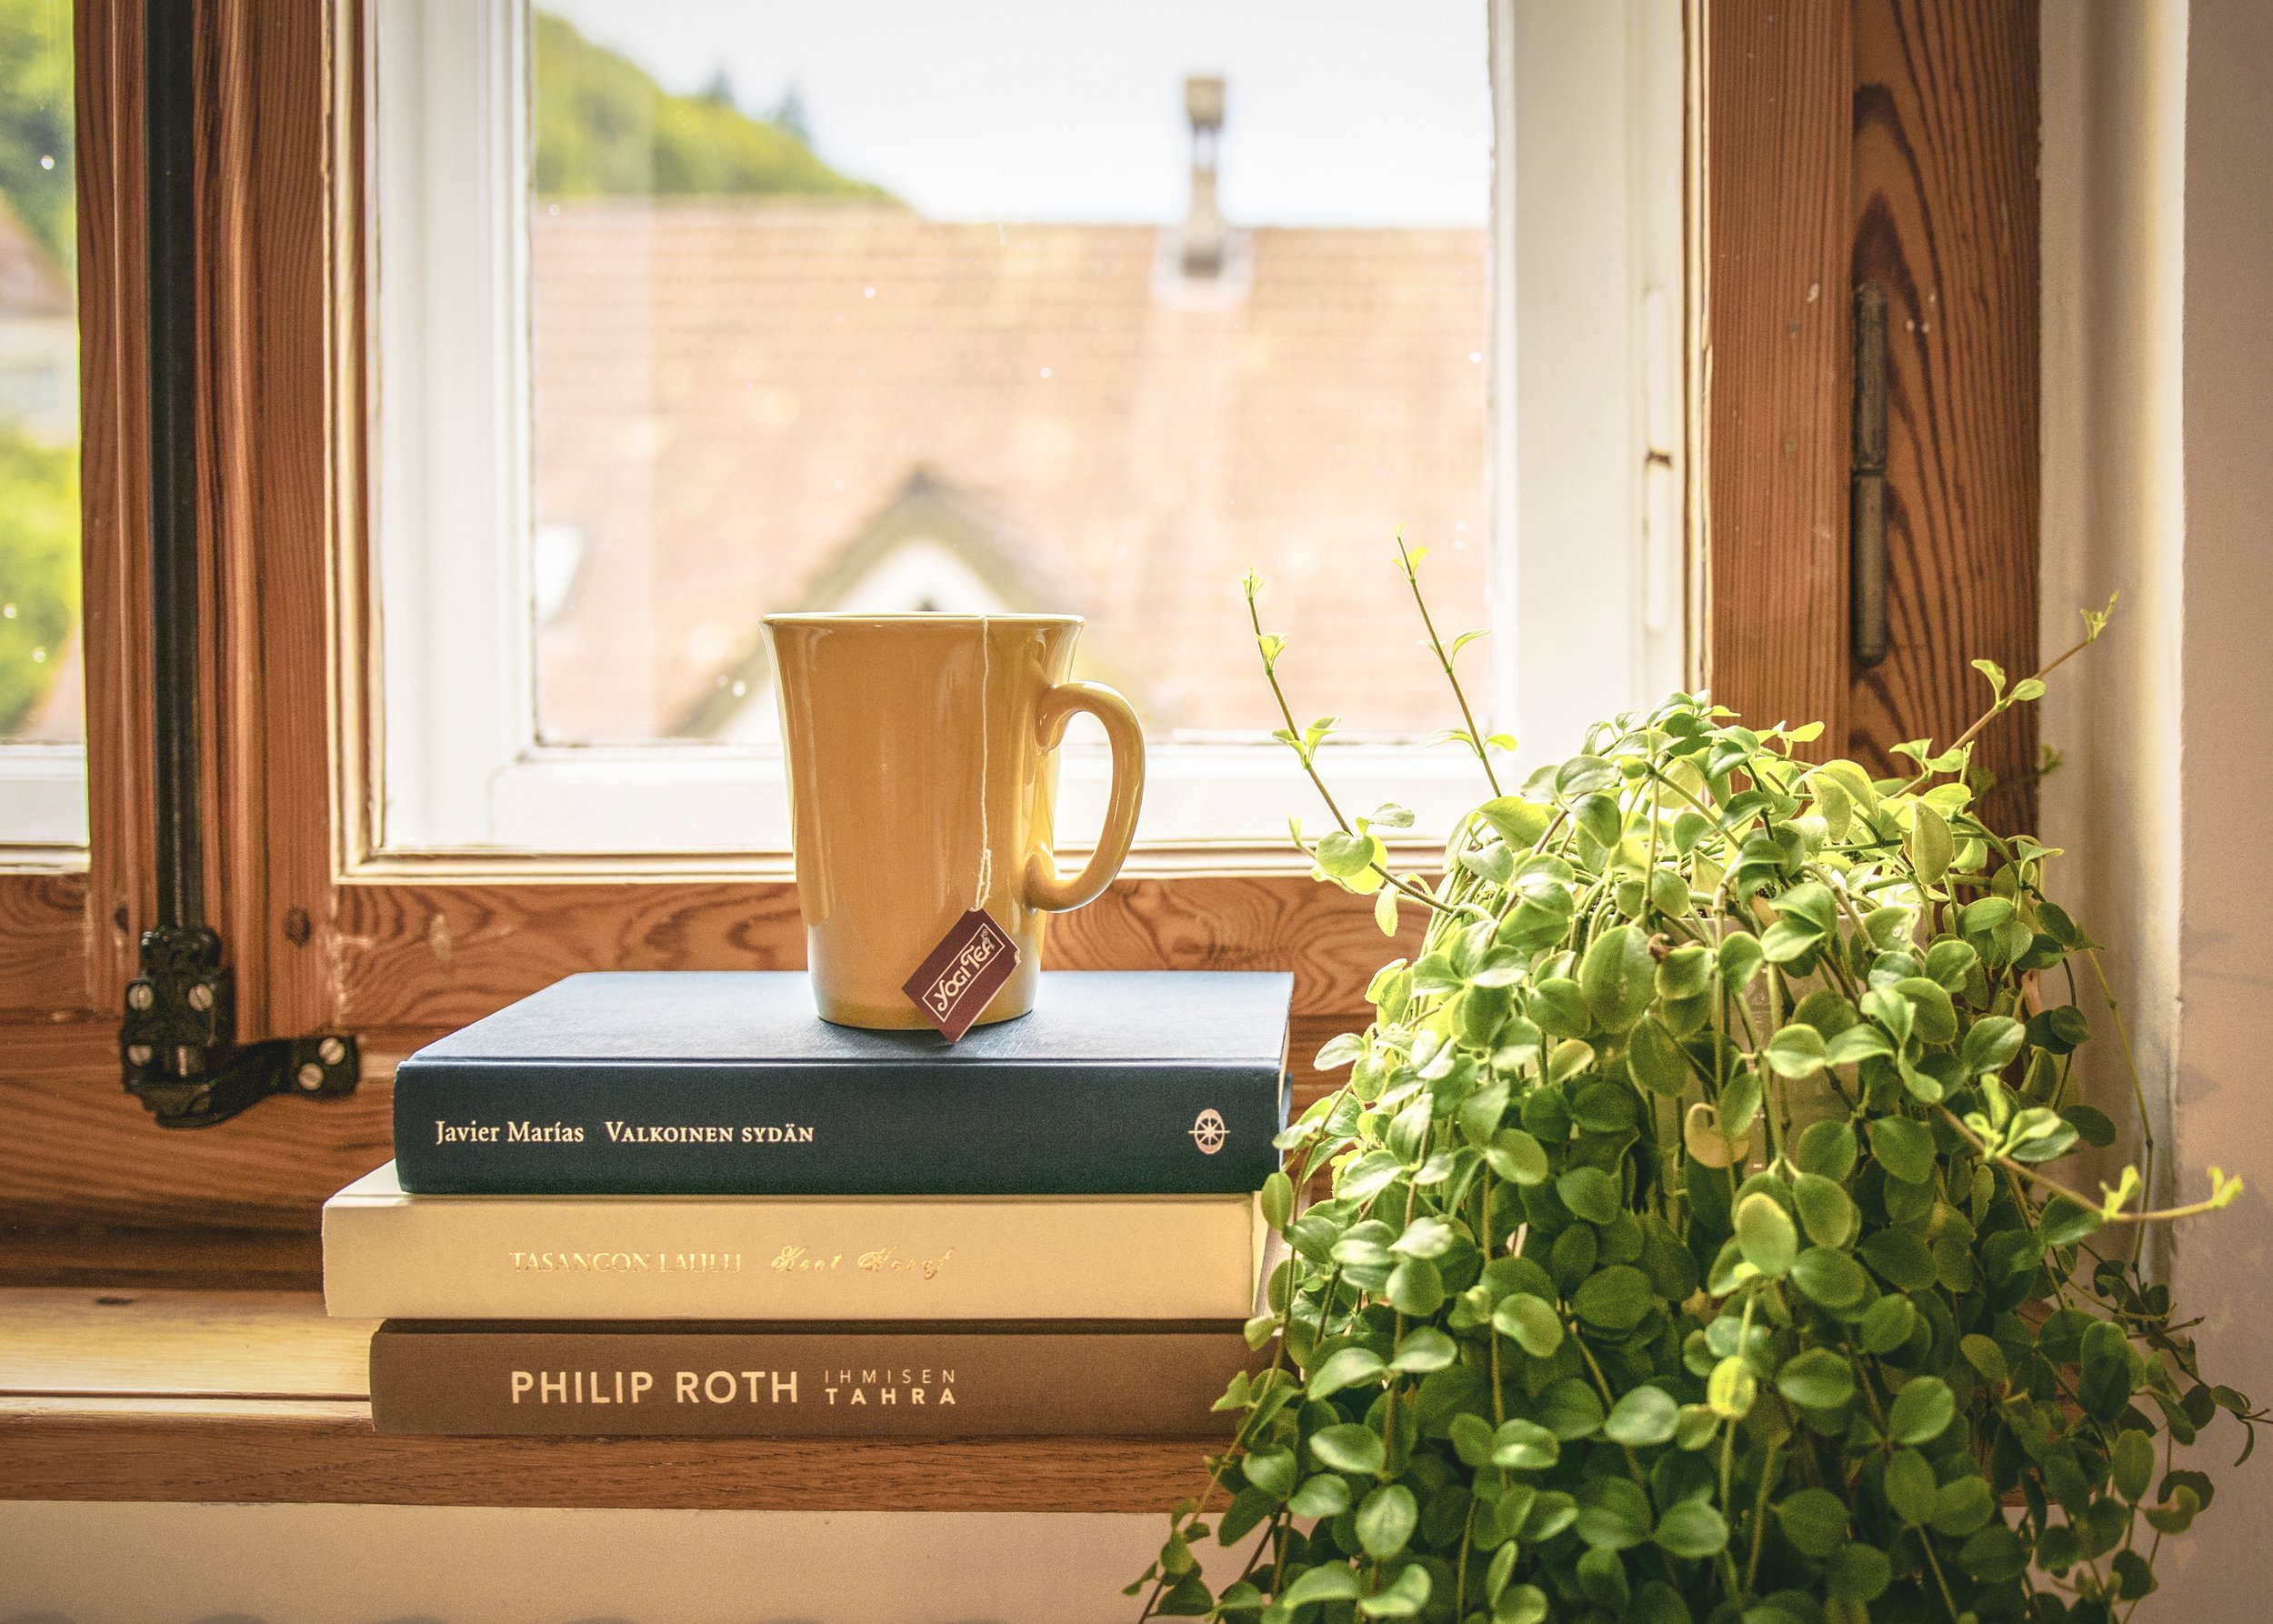 Book and Windowsill.jpg